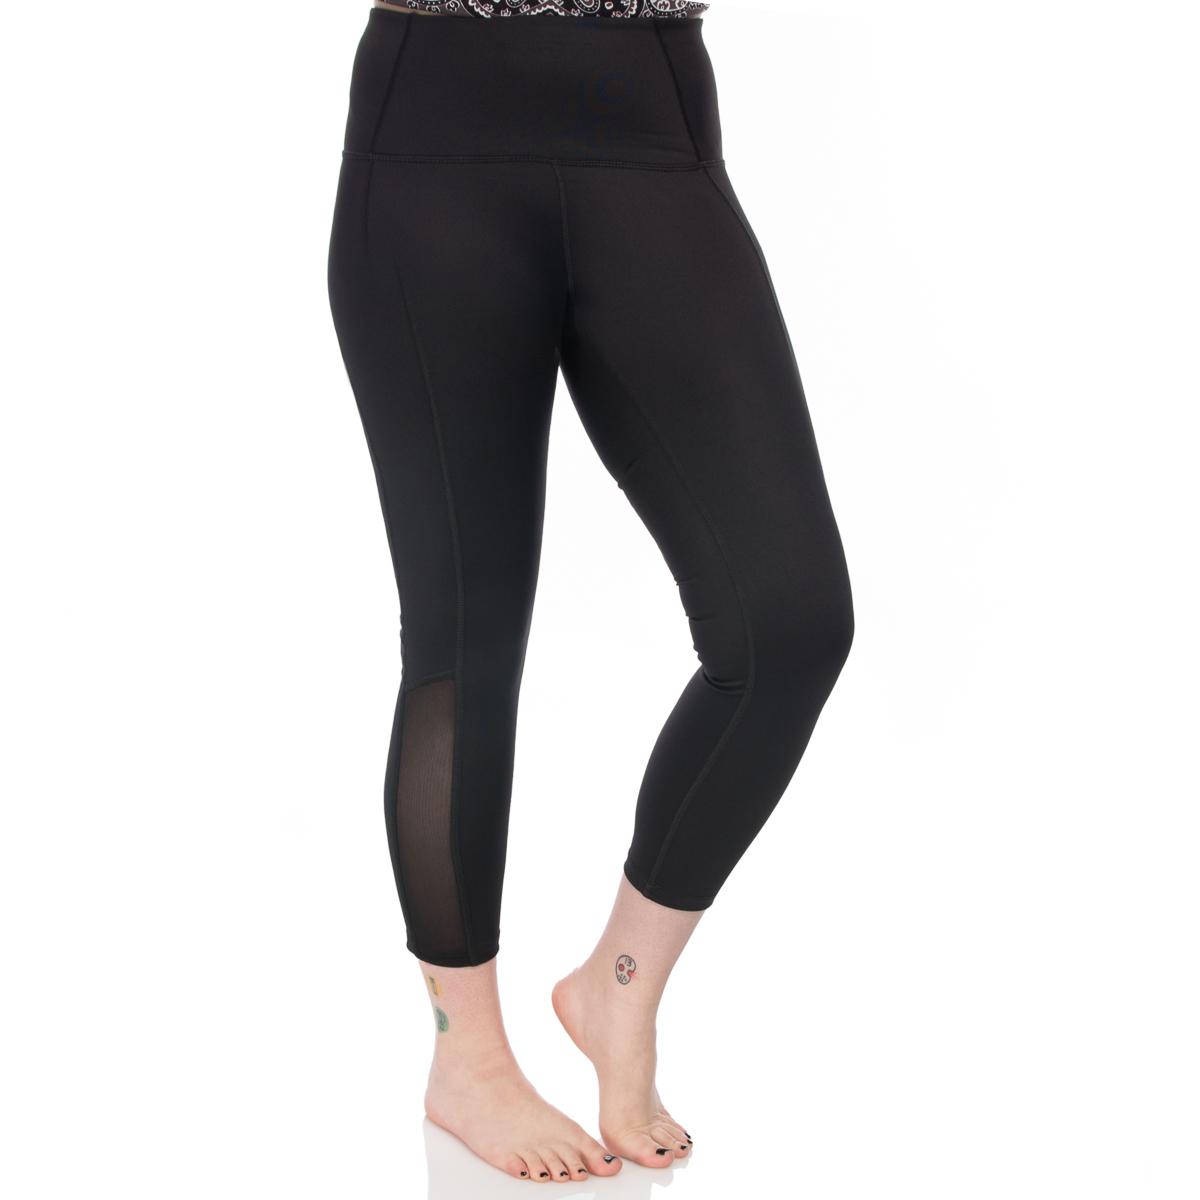 7-8-Length-High-Waist-Moisture-Wicking-UPF-50-Leggings-Run-Gym-Yoga-Pants-Mesh thumbnail 4